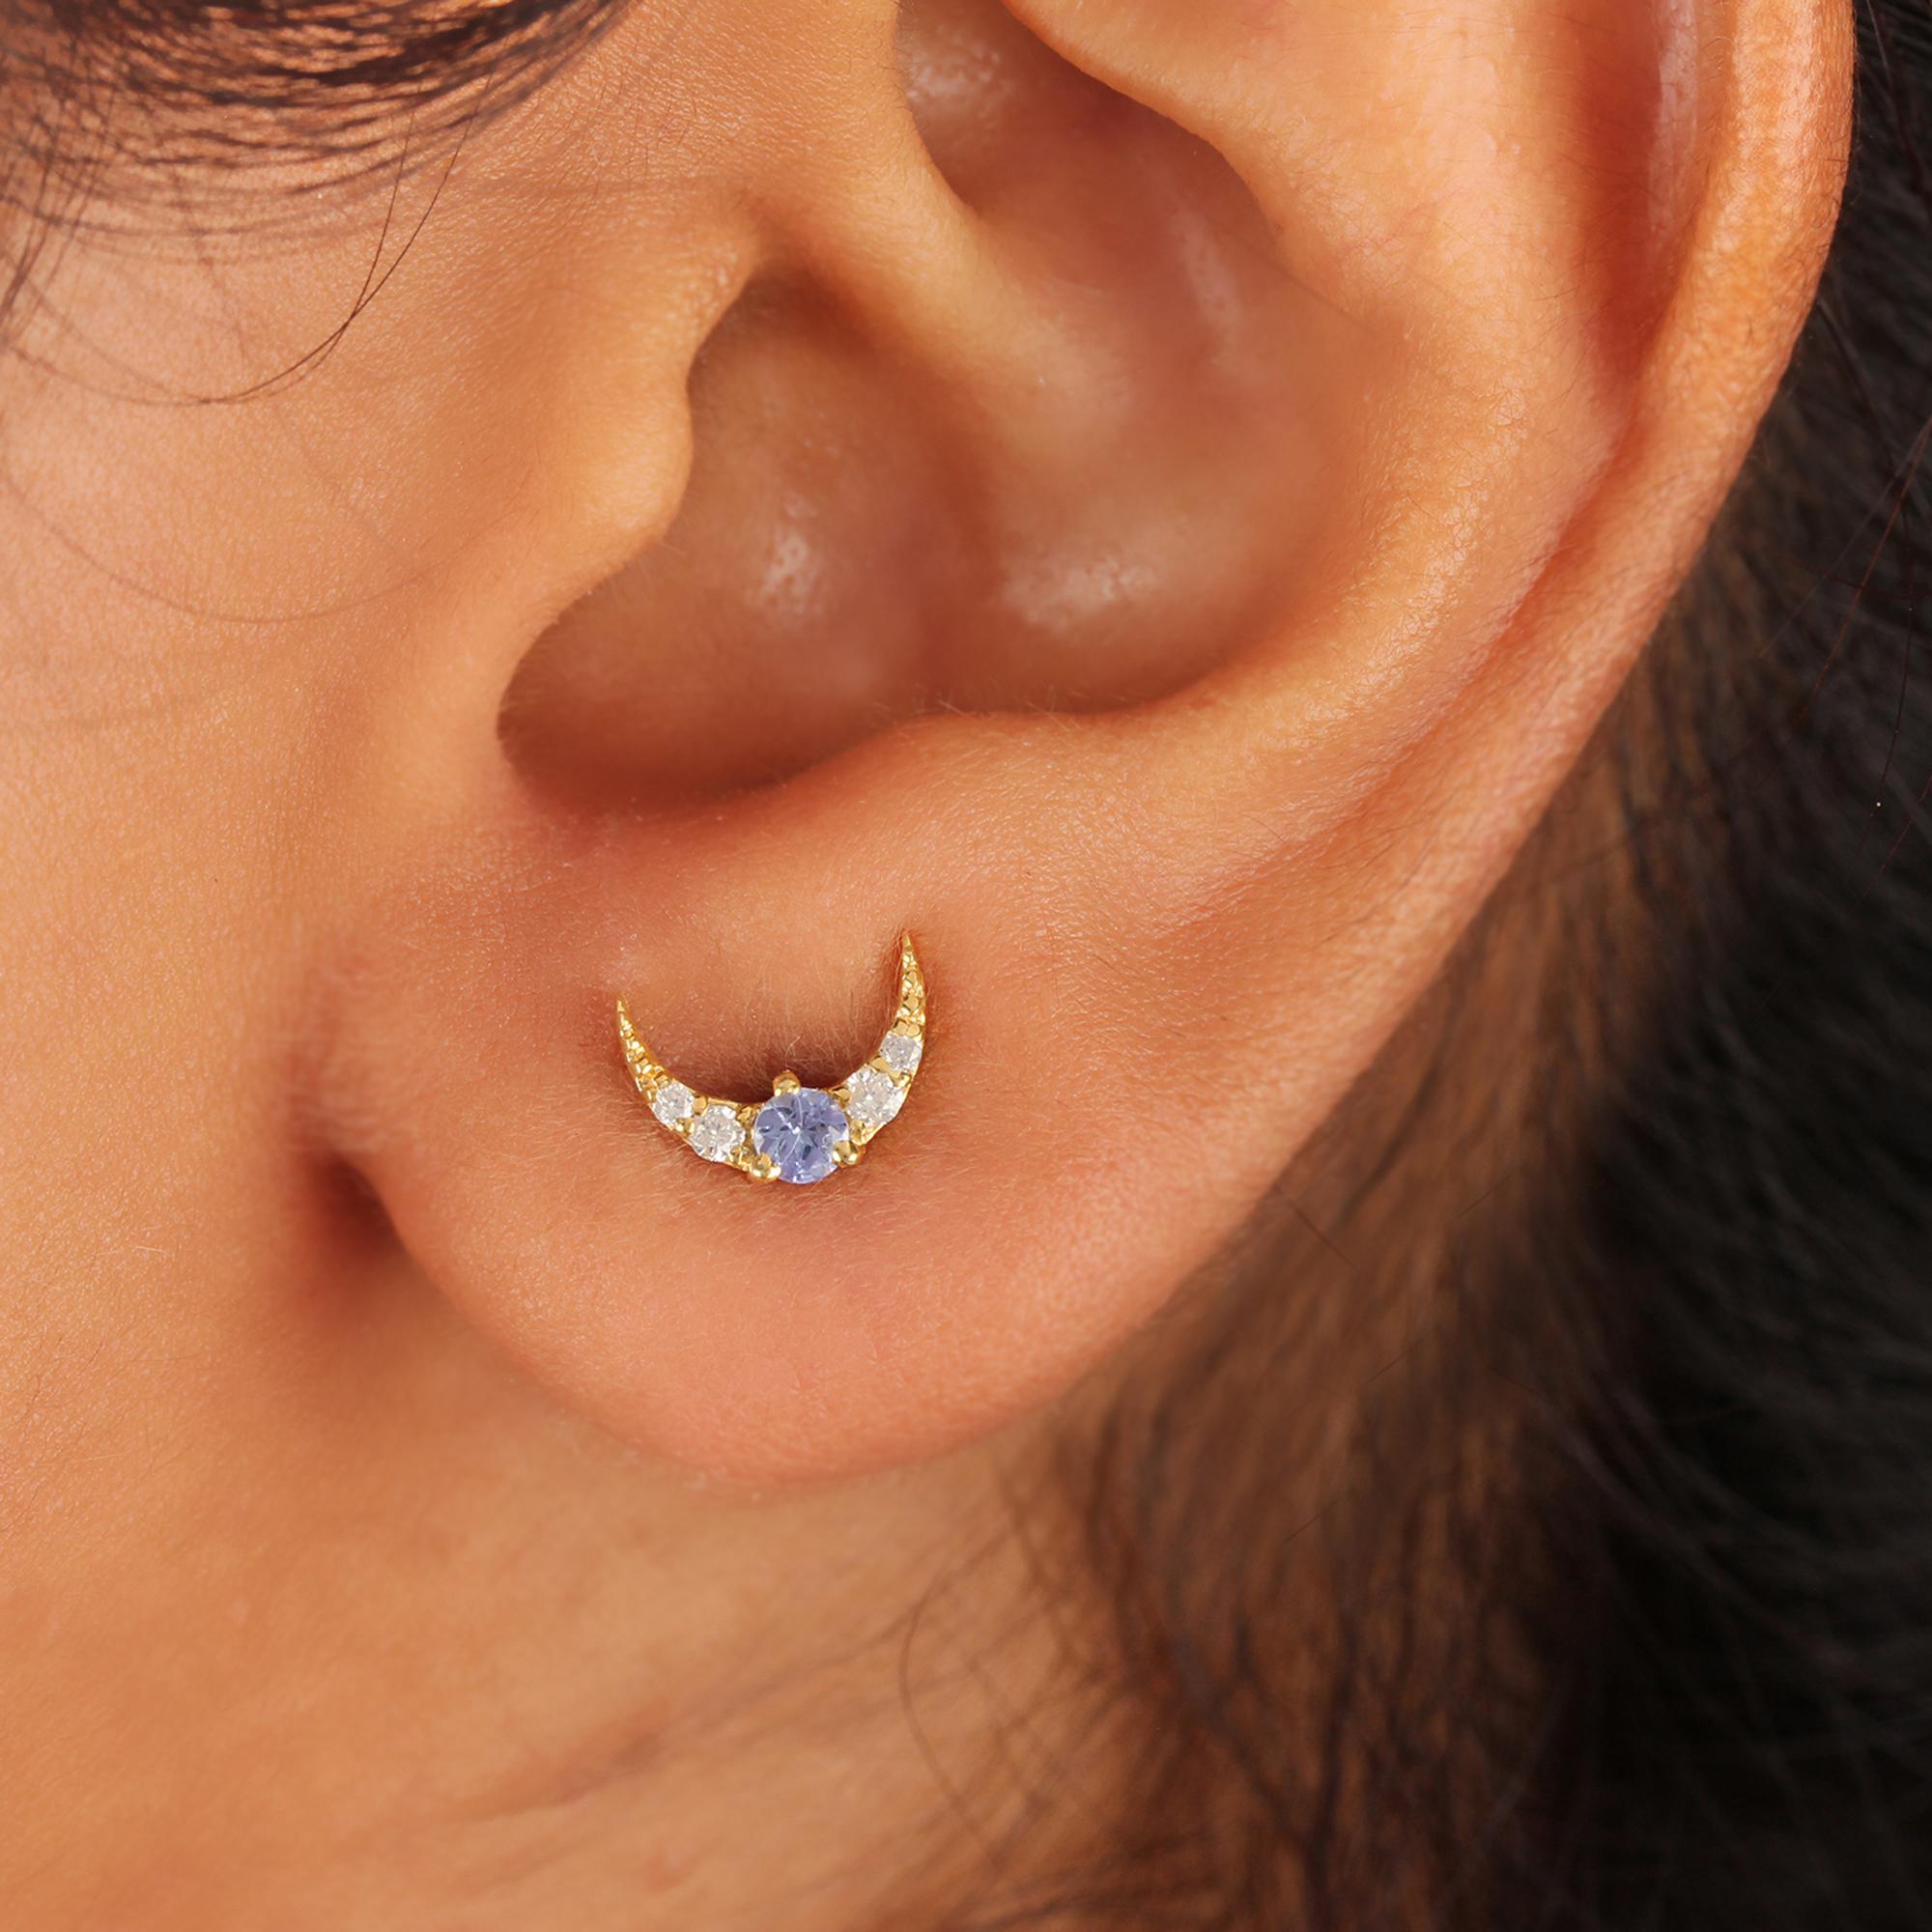 14k Solid Gold Diamond & Natural Tanzanite Minimalist Stud Earrings